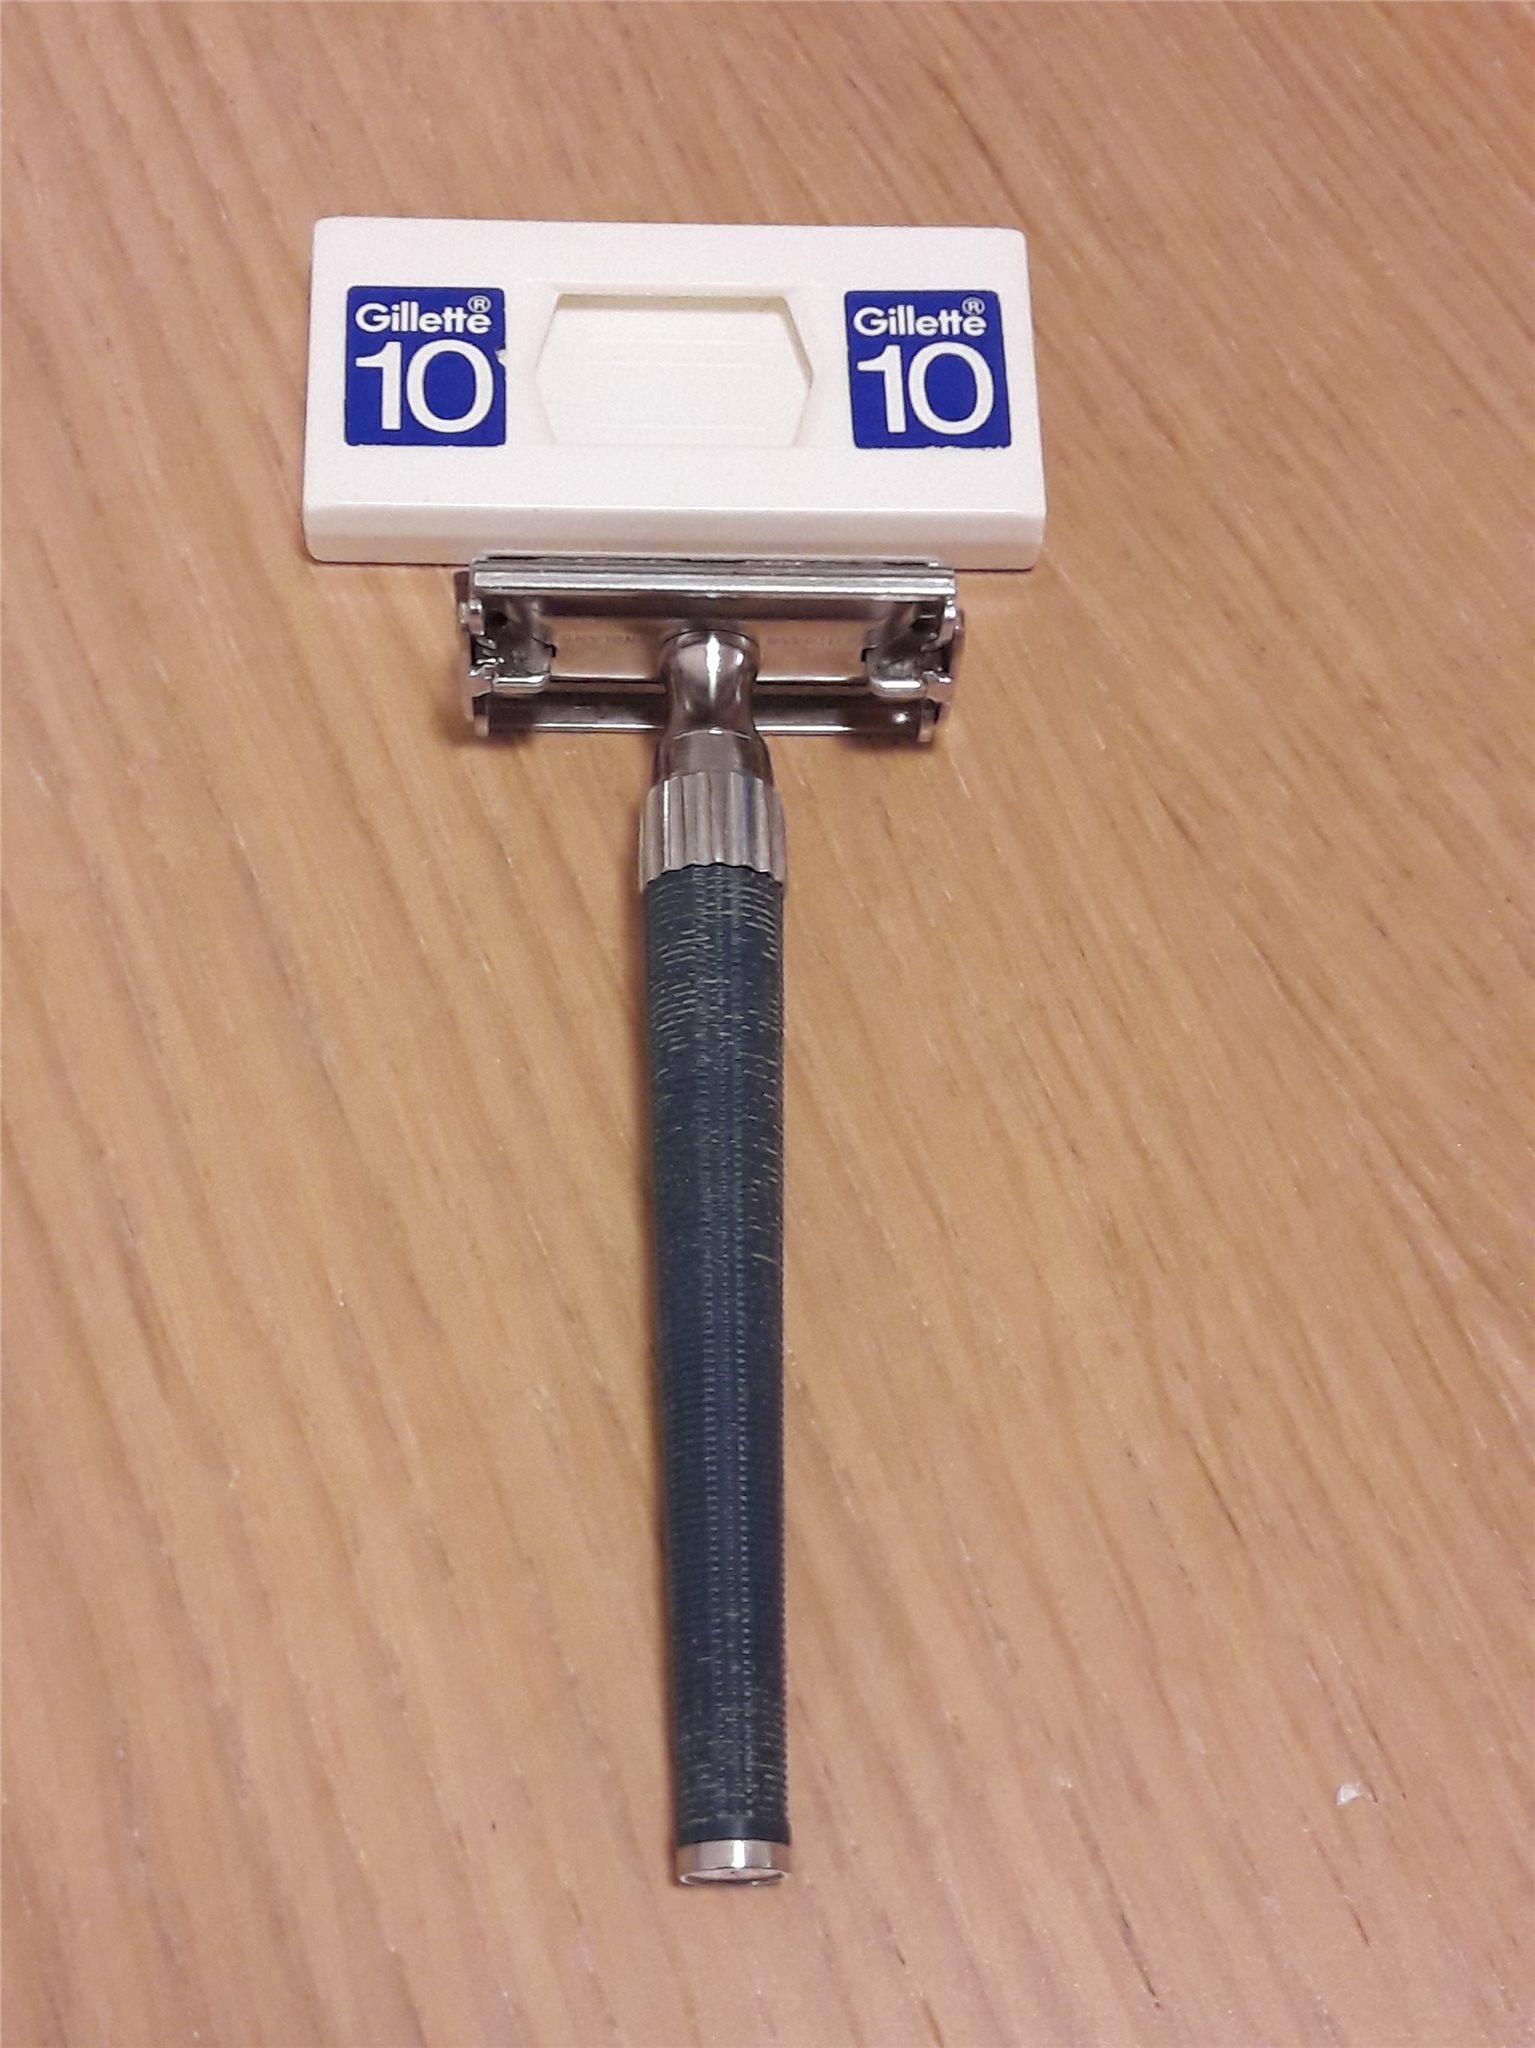 Retro Gillete rakhyvel och rakblad (rakning) Retro Gillete razor and razor  blade e37508347f2c6